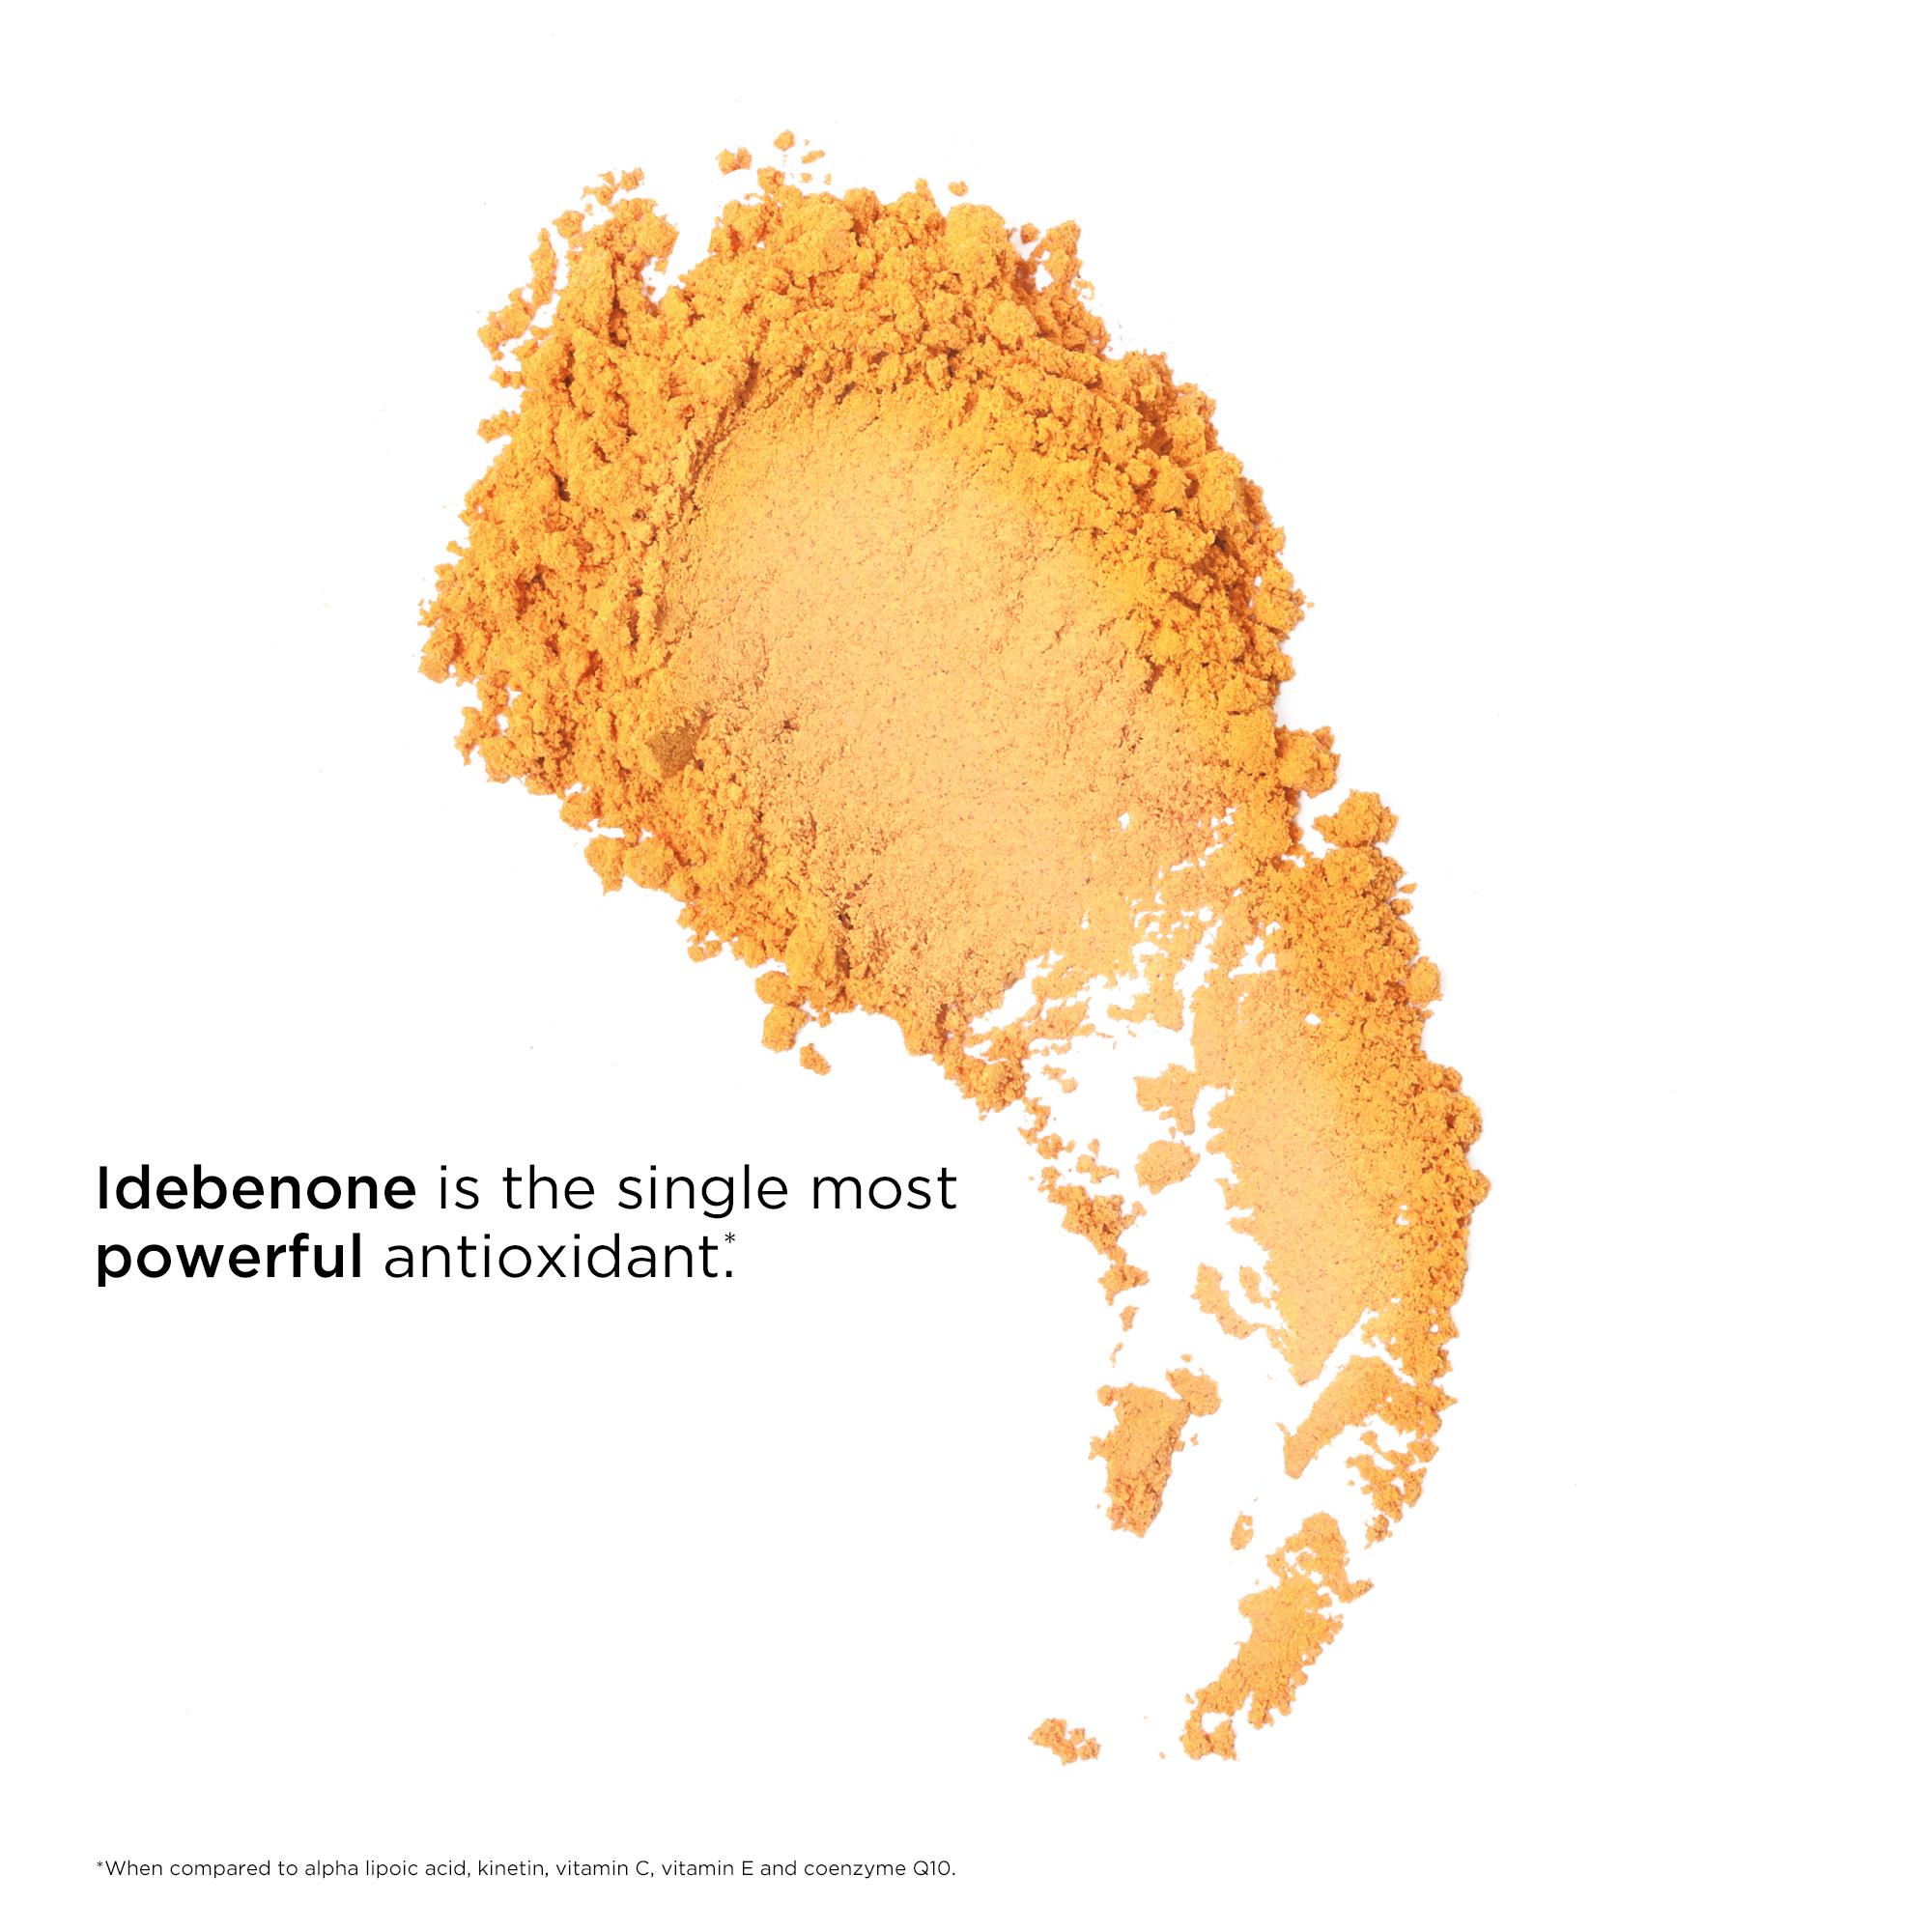 Idebenone is the single most powerful antioxidant when compared to alpha lipoic acid, kinetin, vitamin C, vitamin E and coenzyme Q10.